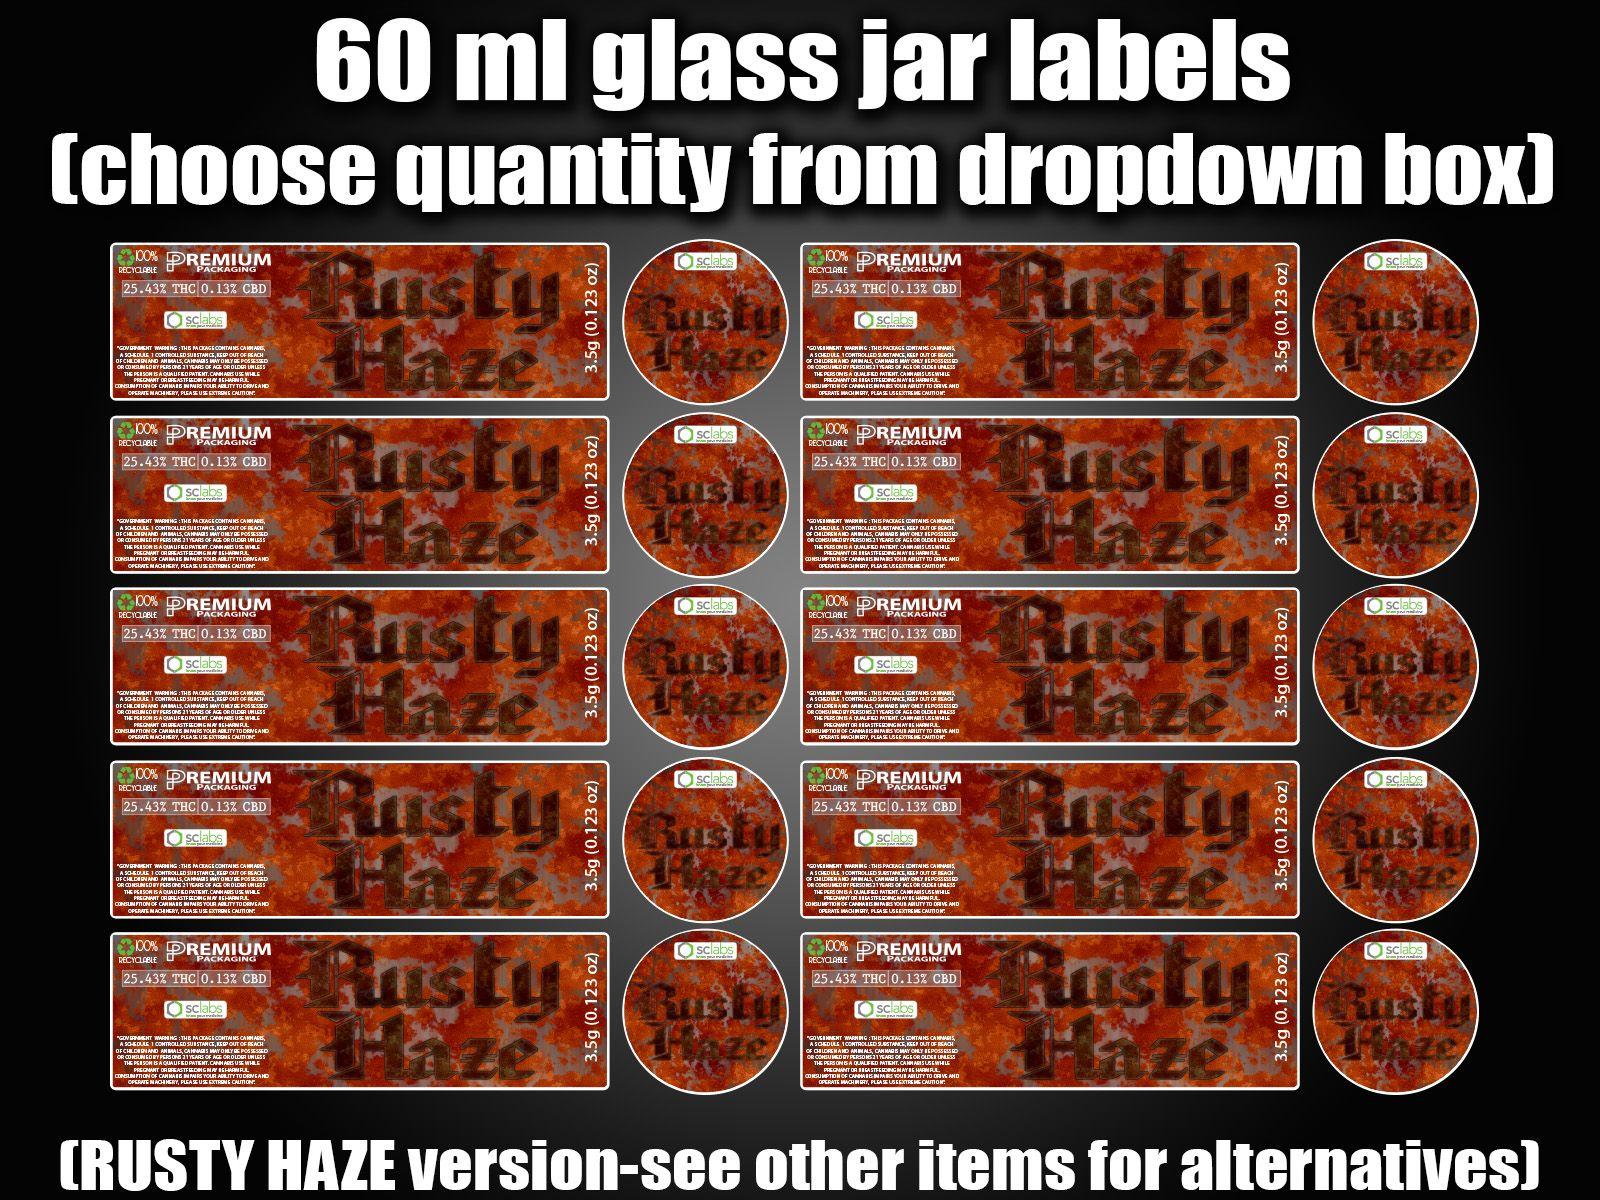 RUSTY HAZE 60ml glass cali jar labels RX pressitin HIGH QUALITY